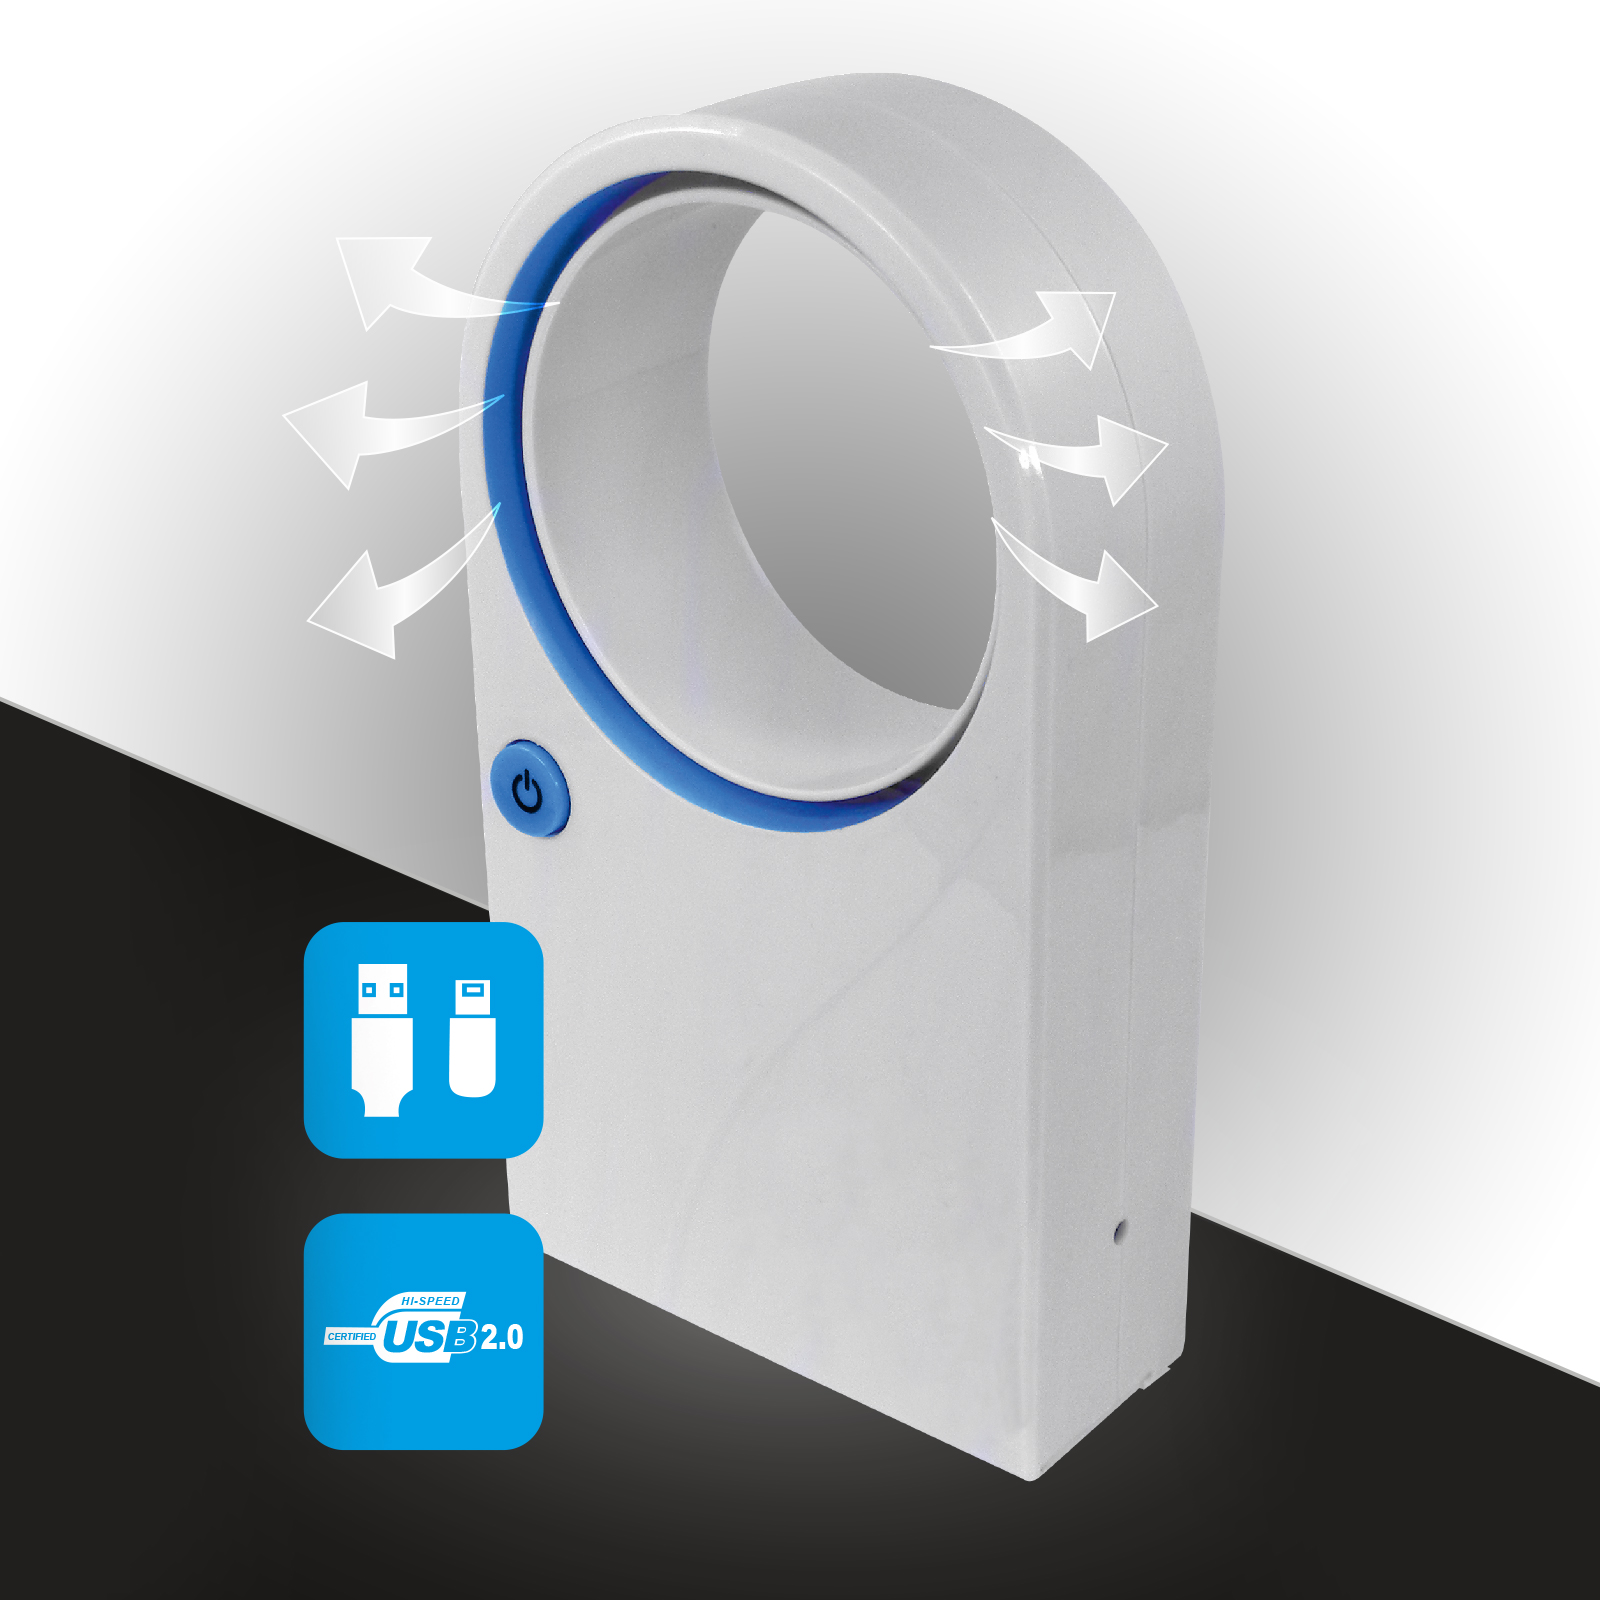 ventilator ohne rotor ppt servosistemi primerjava elektri. Black Bedroom Furniture Sets. Home Design Ideas